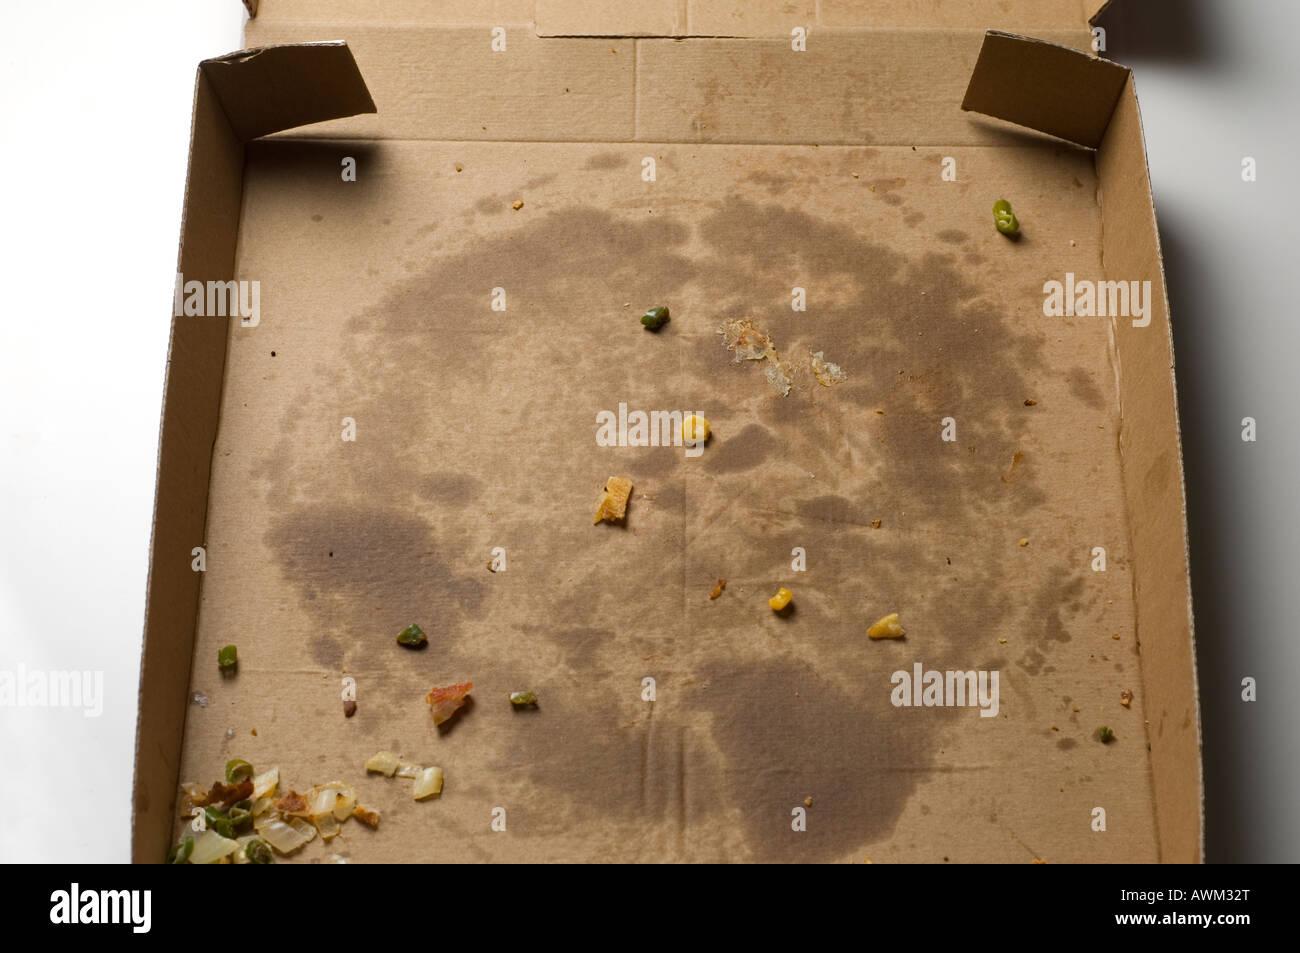 Empty Pizza Box Stock Photo, Royalty Free Image: 16609295 - Alamy